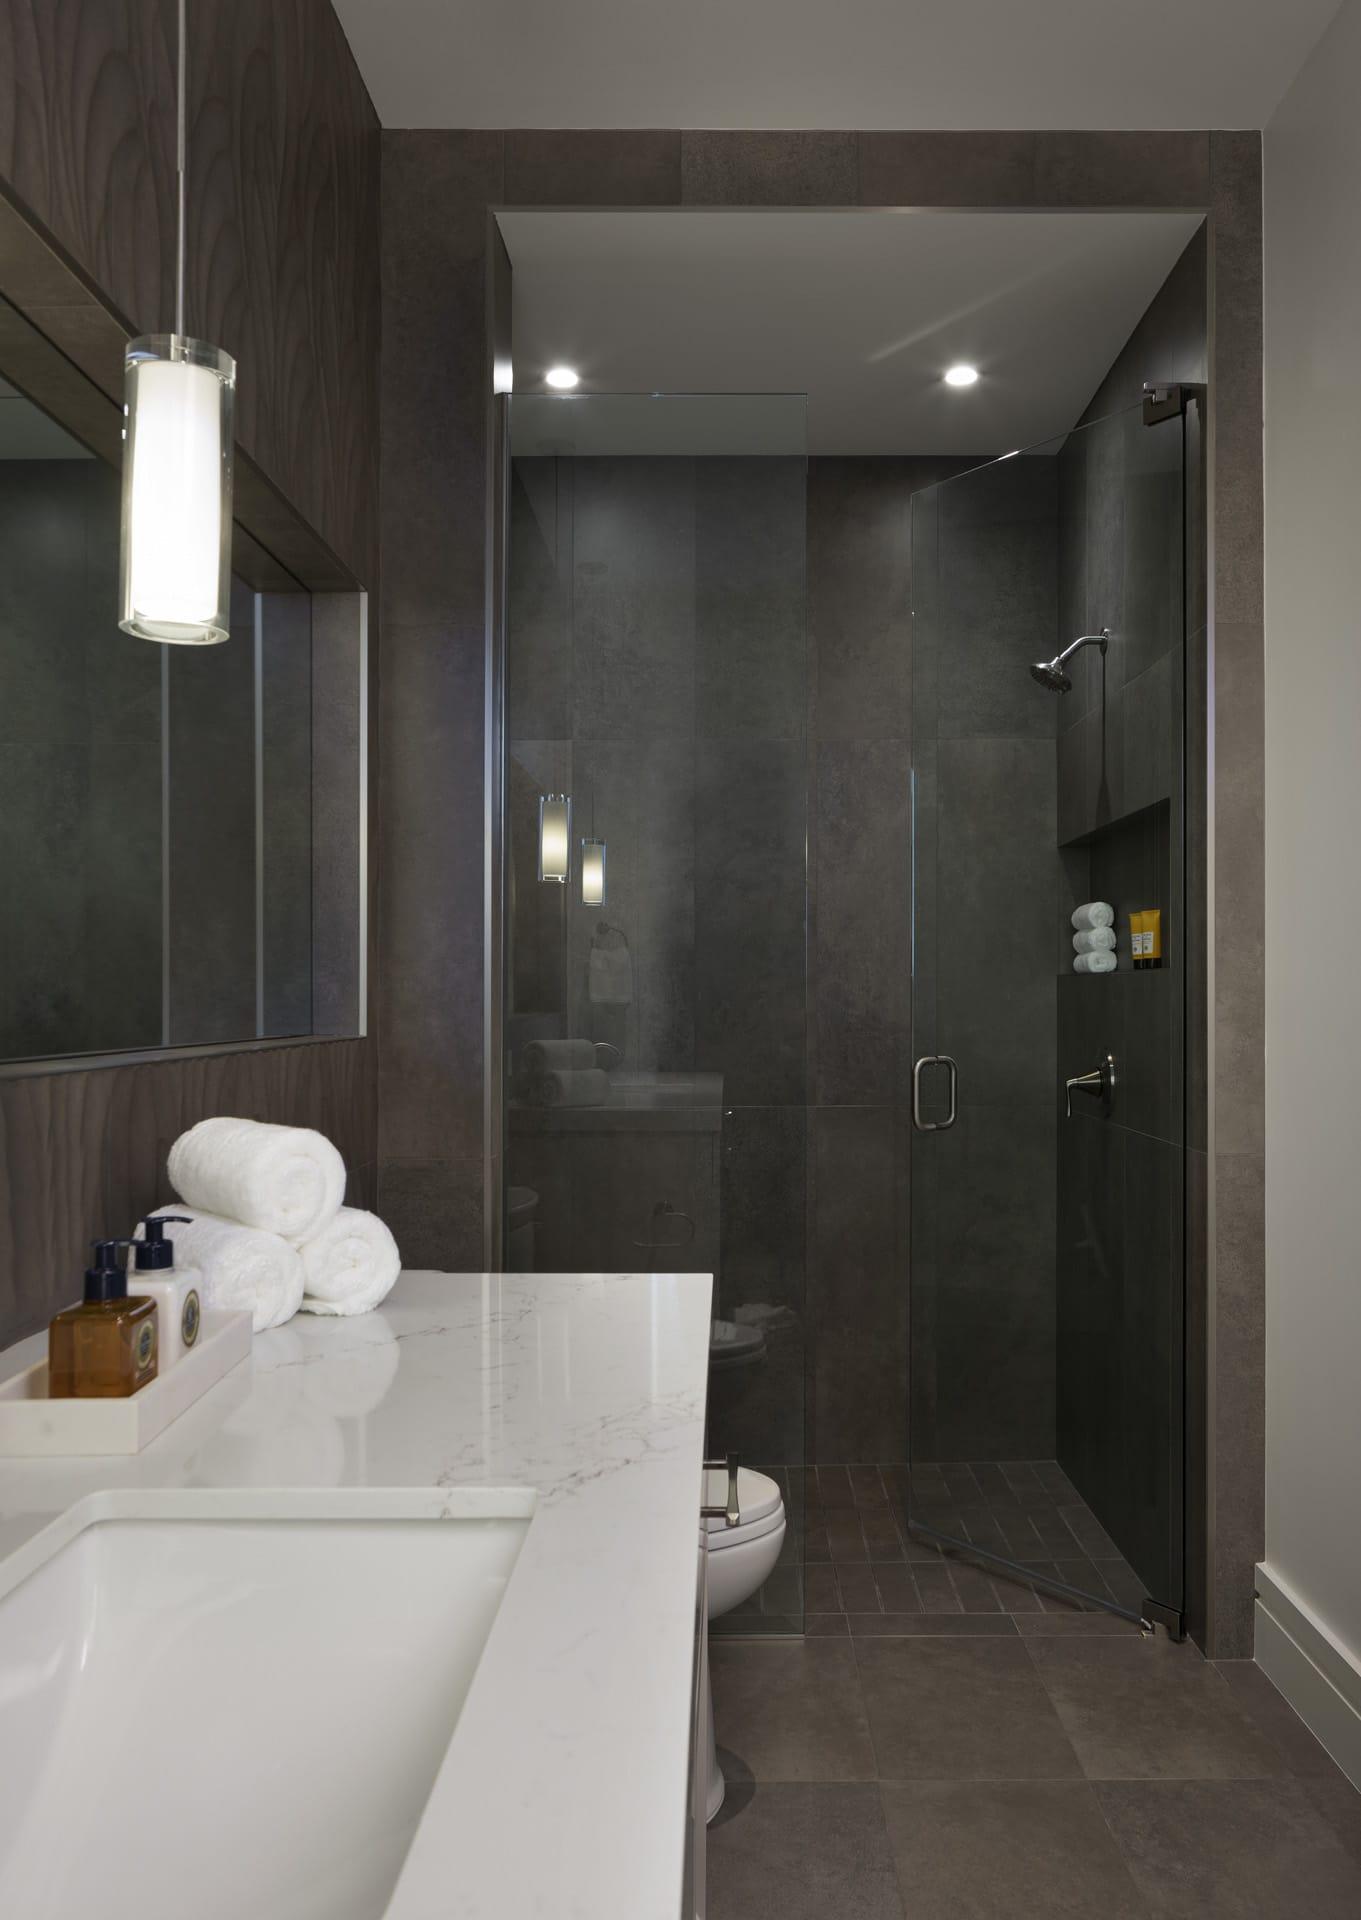 Port Royal Home - Guest Bathroom